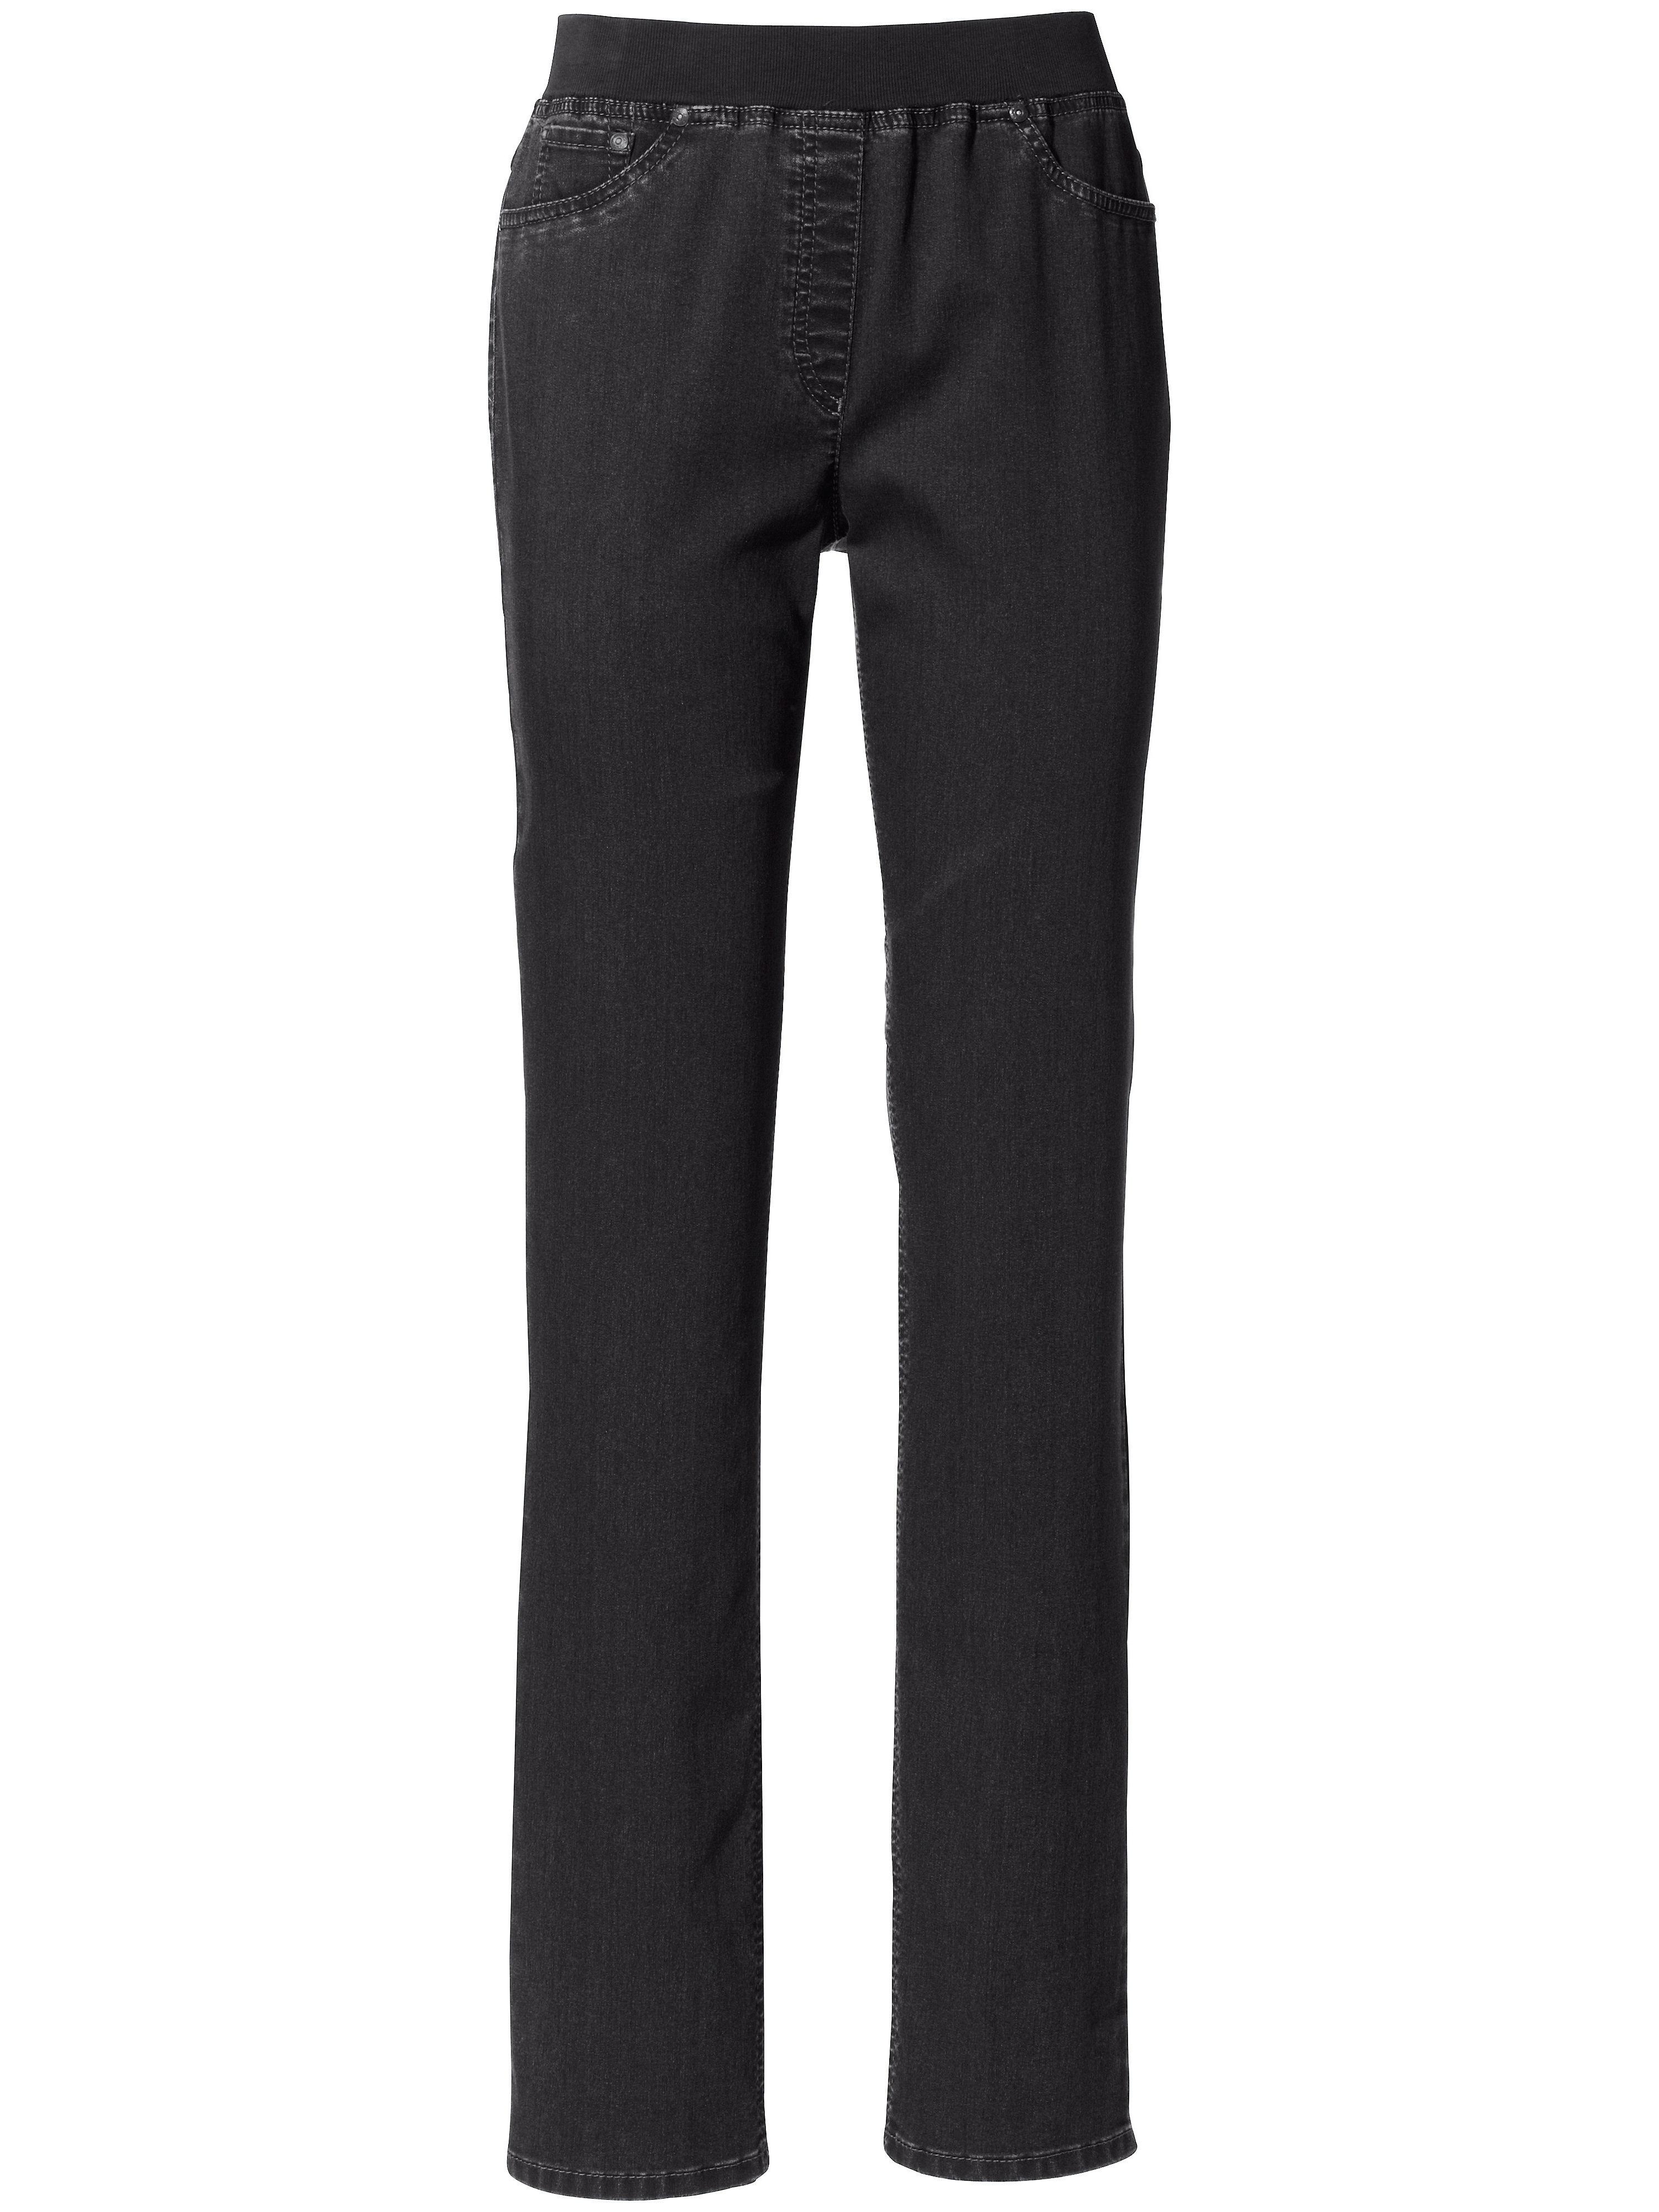 Le pantalon ProForm Slim, modèle PAMINA  Raphaela by Brax denim